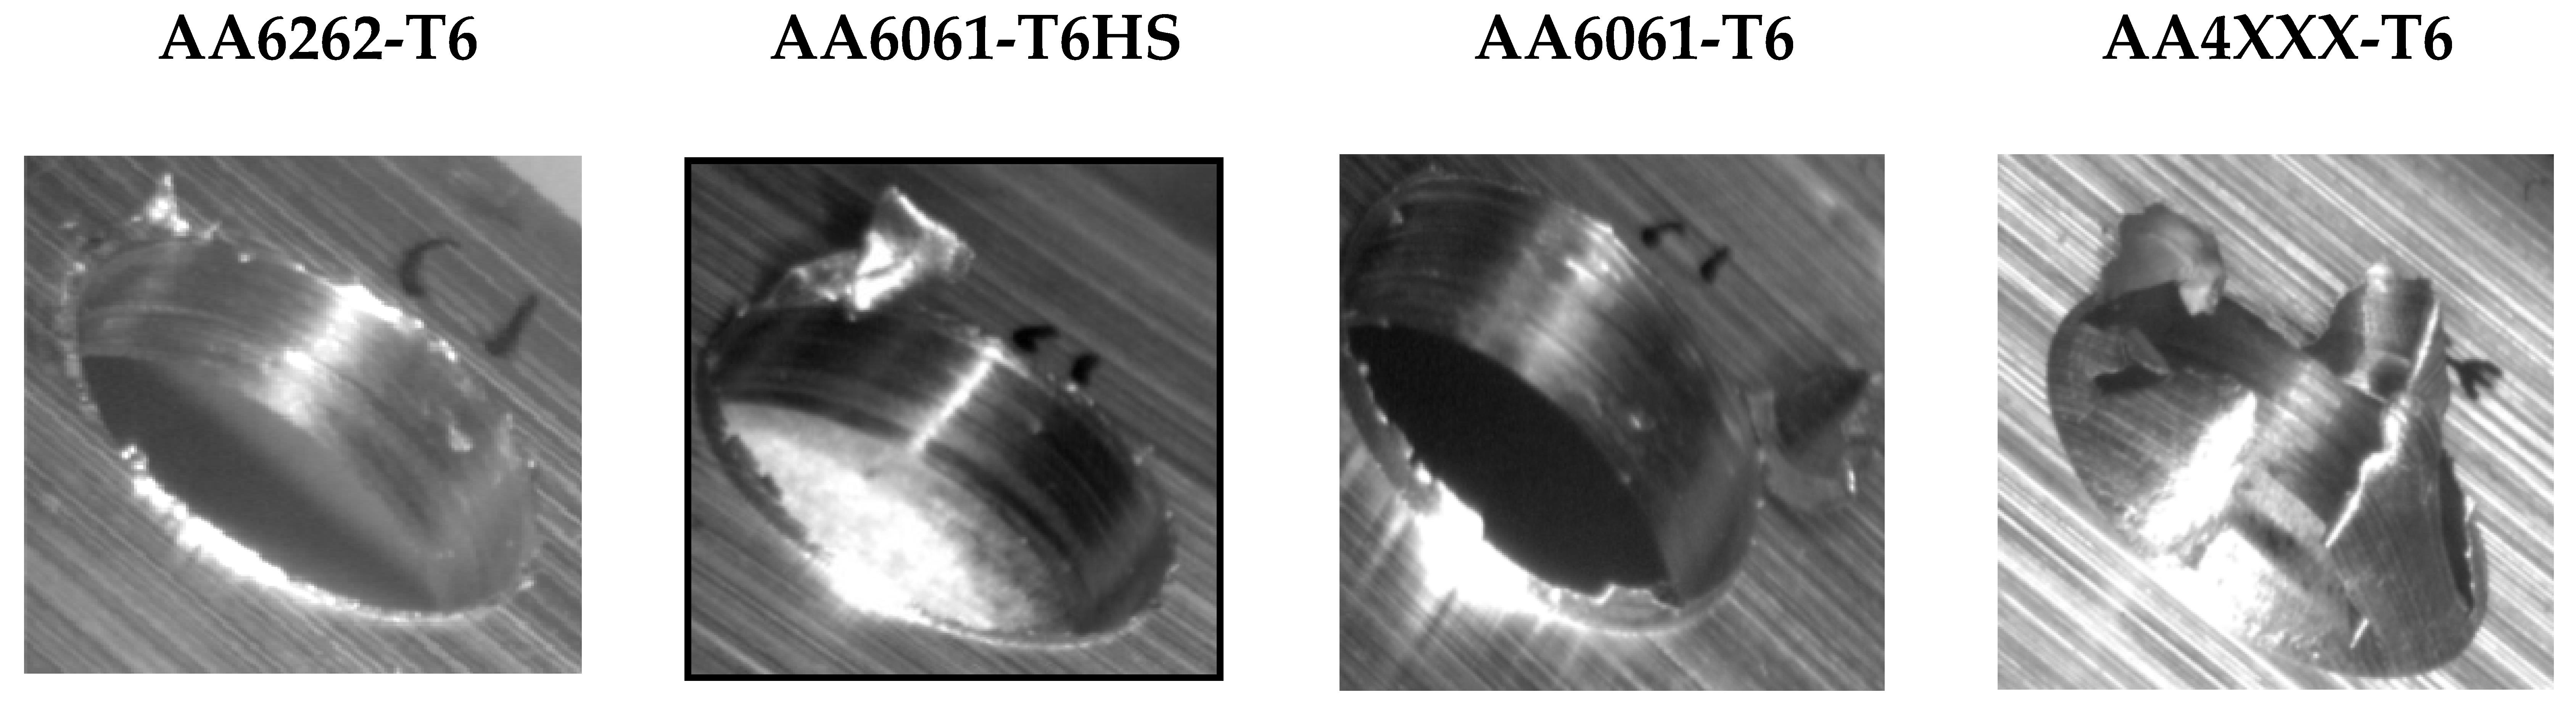 Machining Burrs Formation & Deburring of Aluminium Alloys | IntechOpen